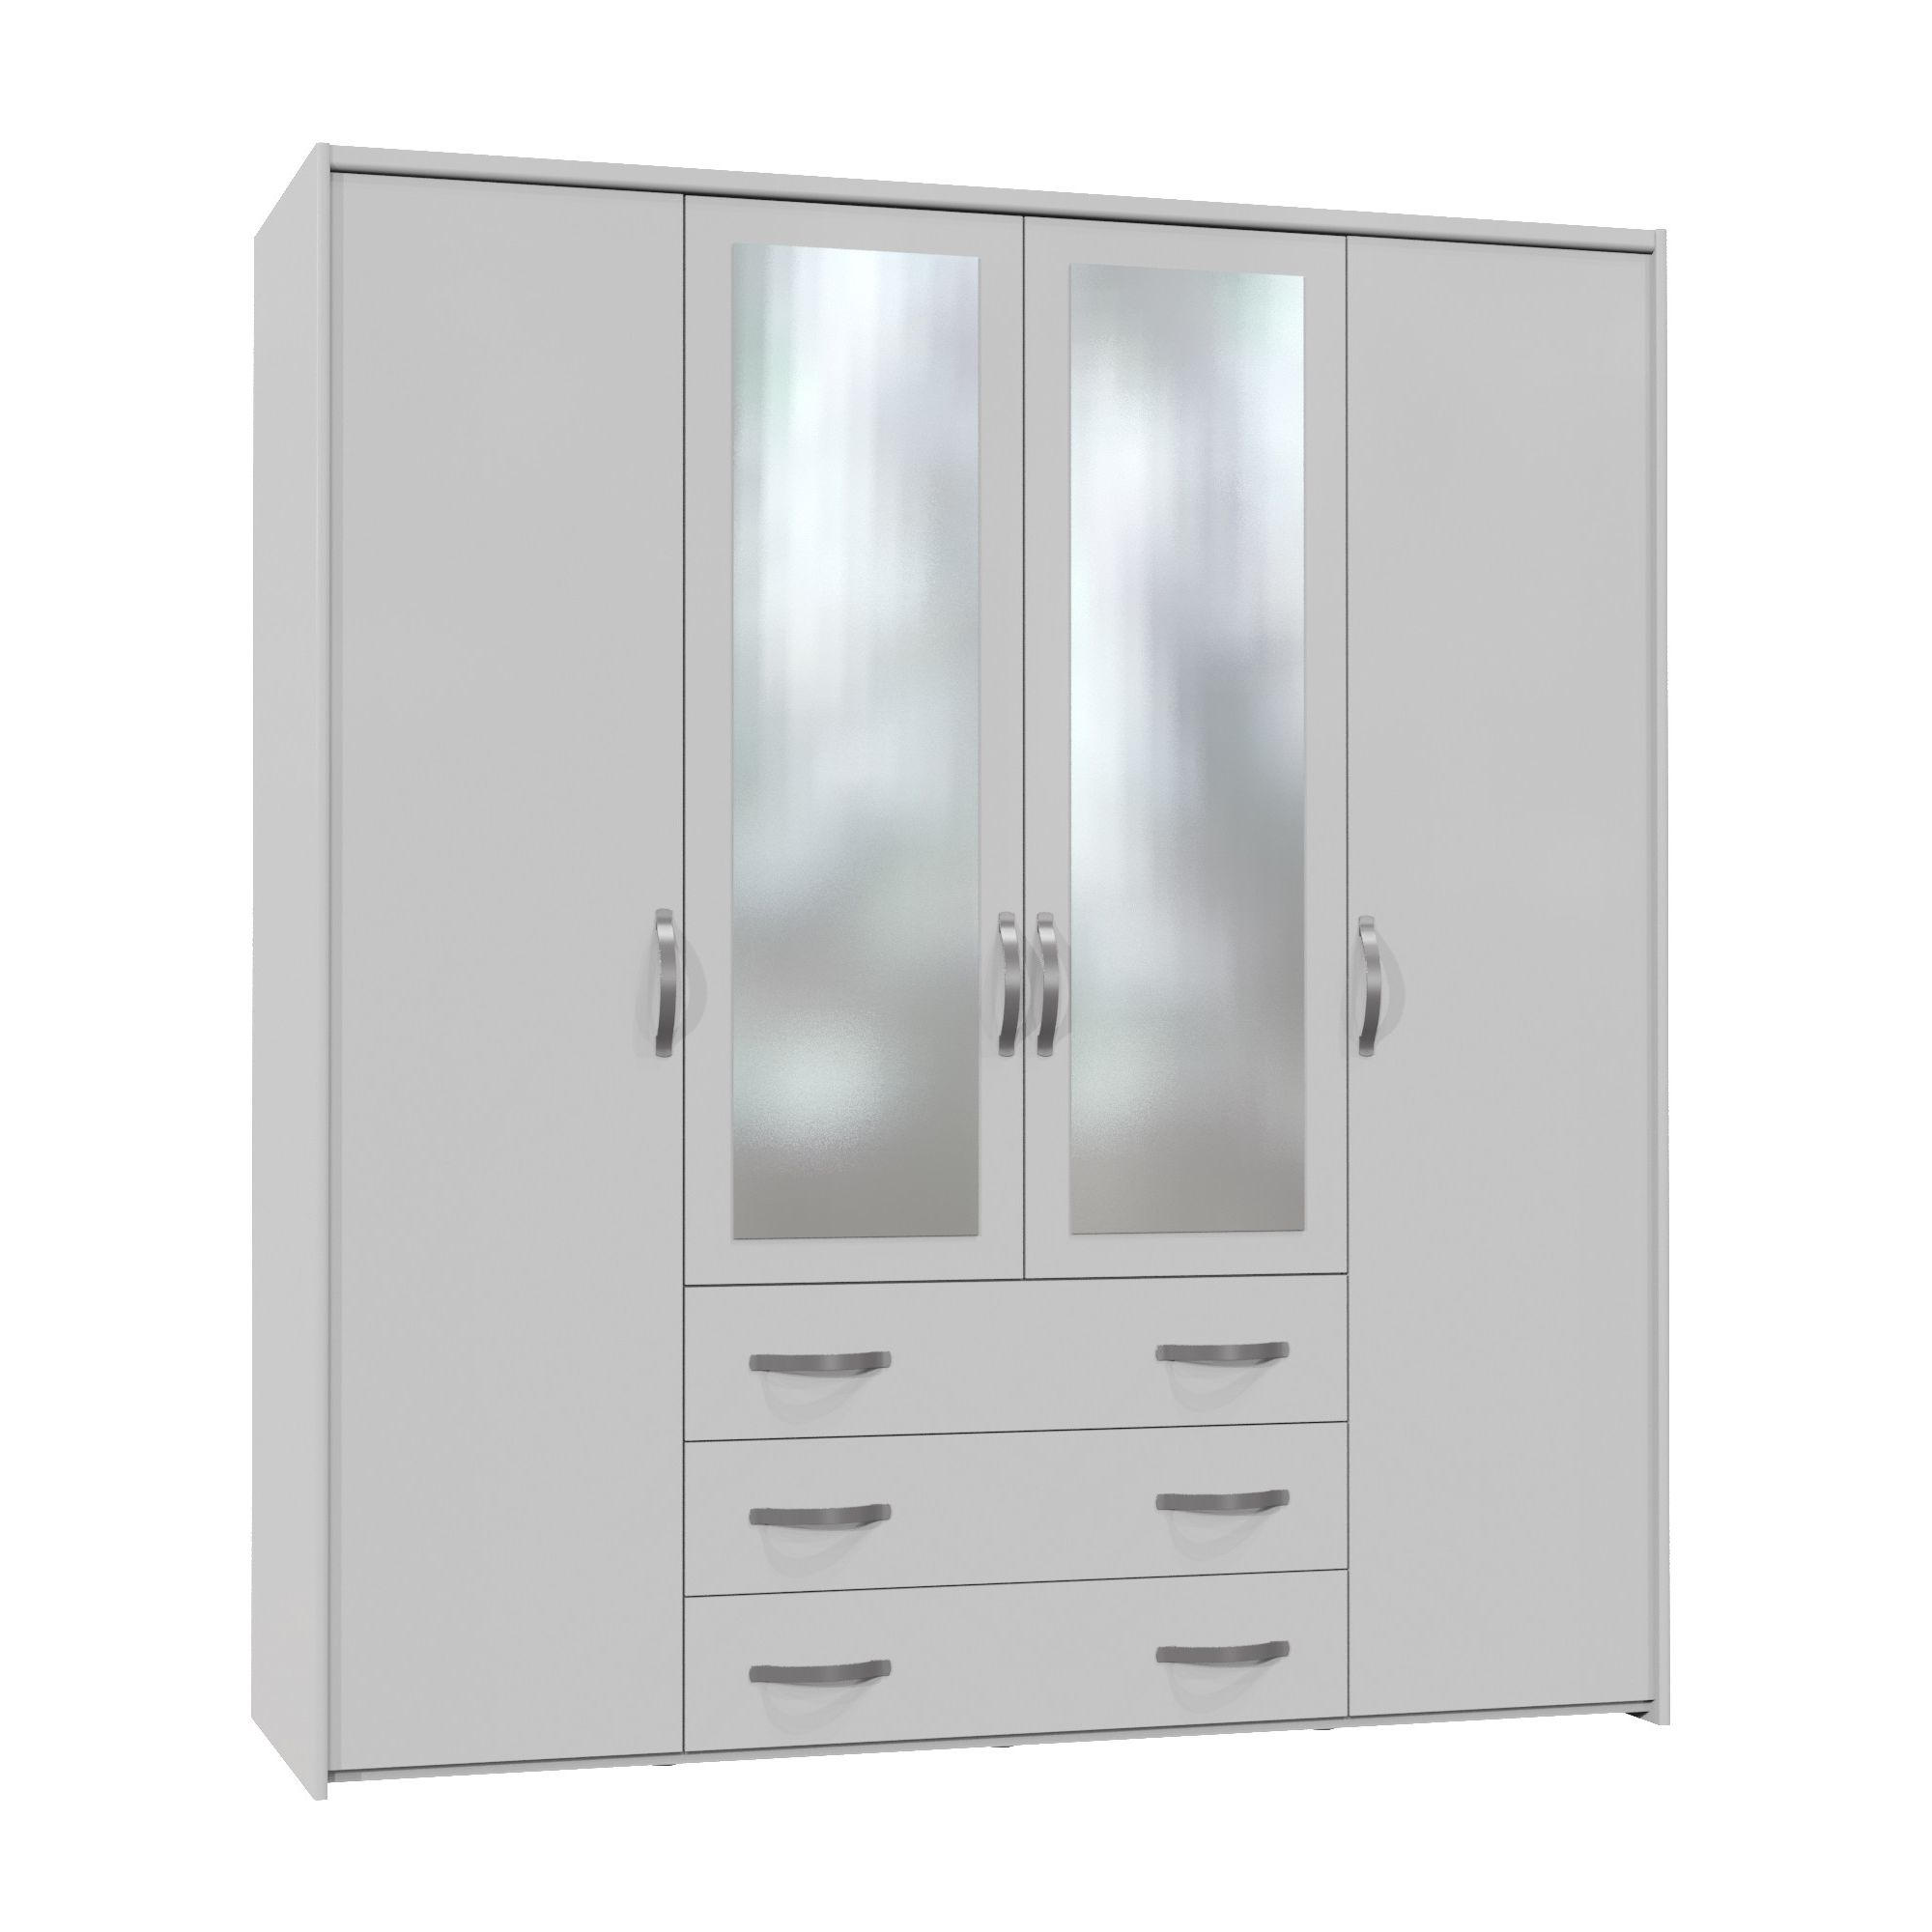 Altruna Now 4 Doors Wardrobe - White at Tesco Direct